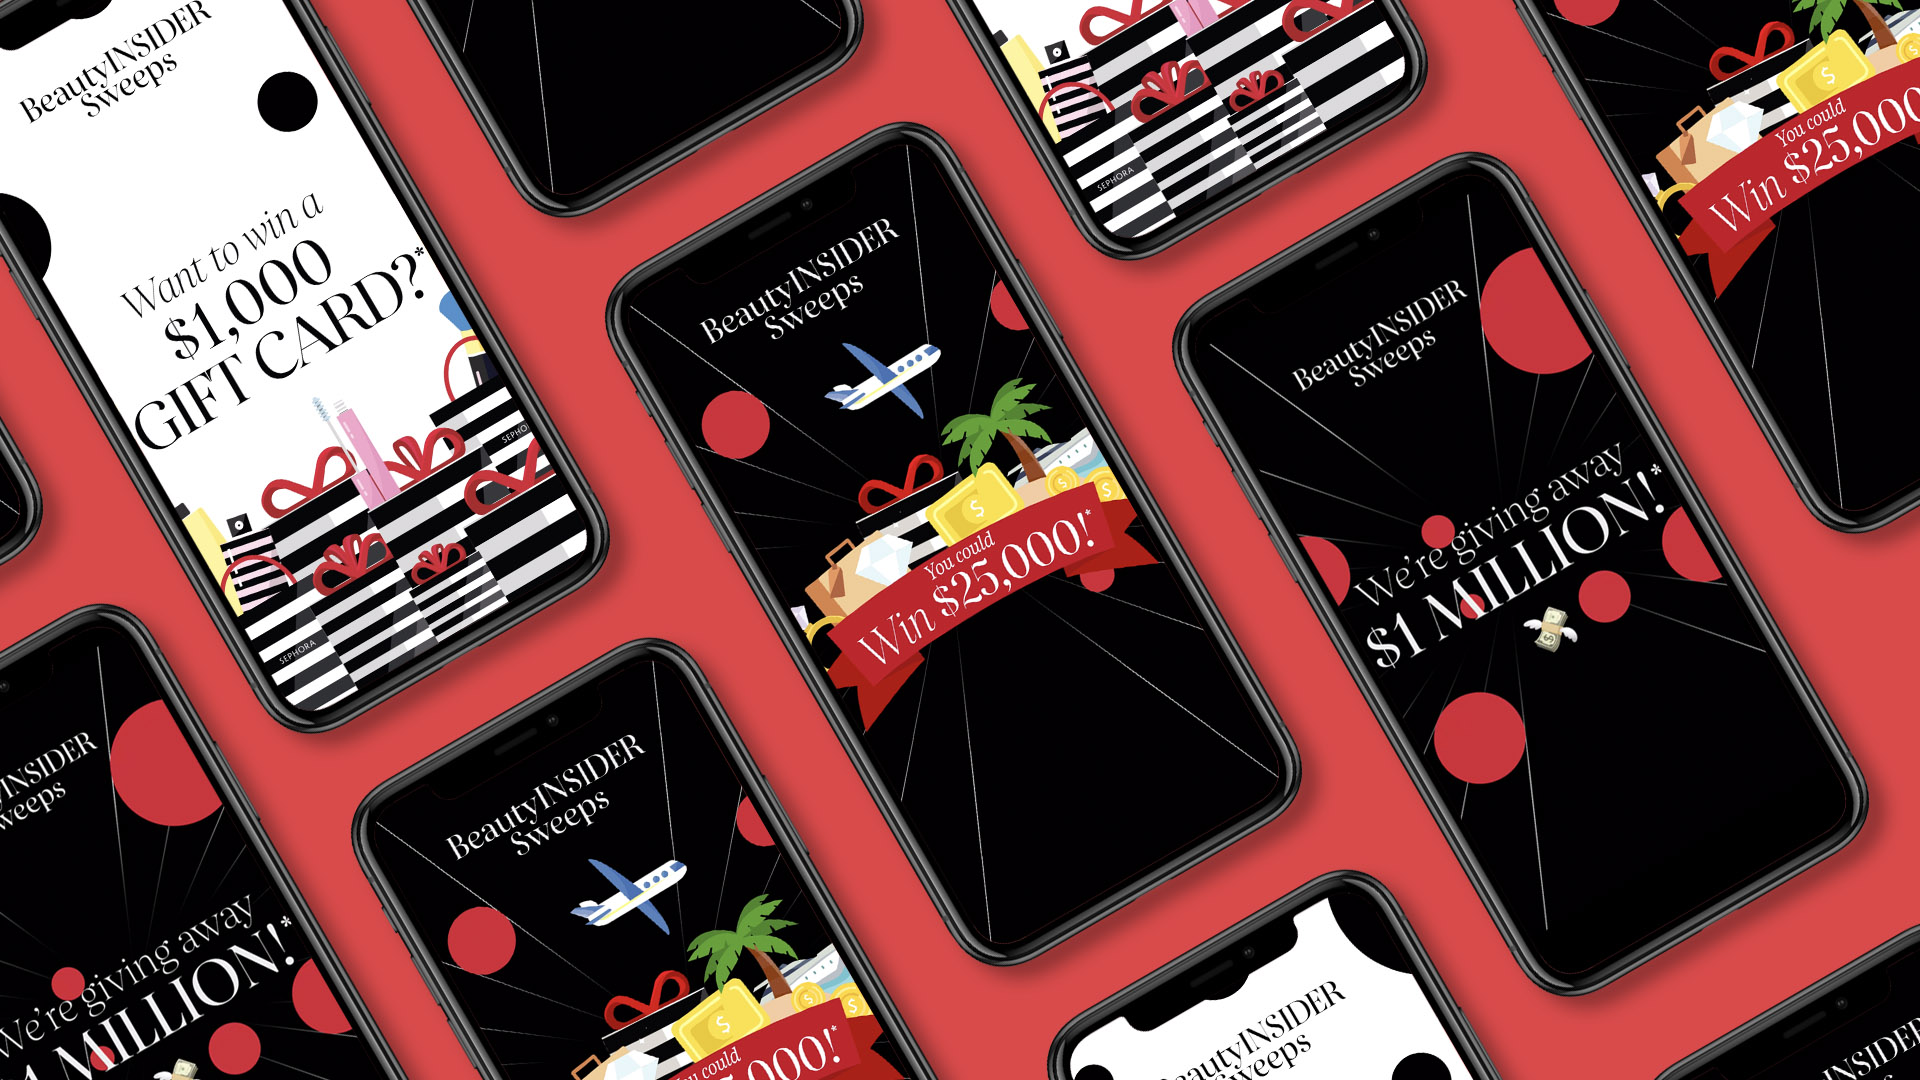 Sephora-Phone-Cover-Image